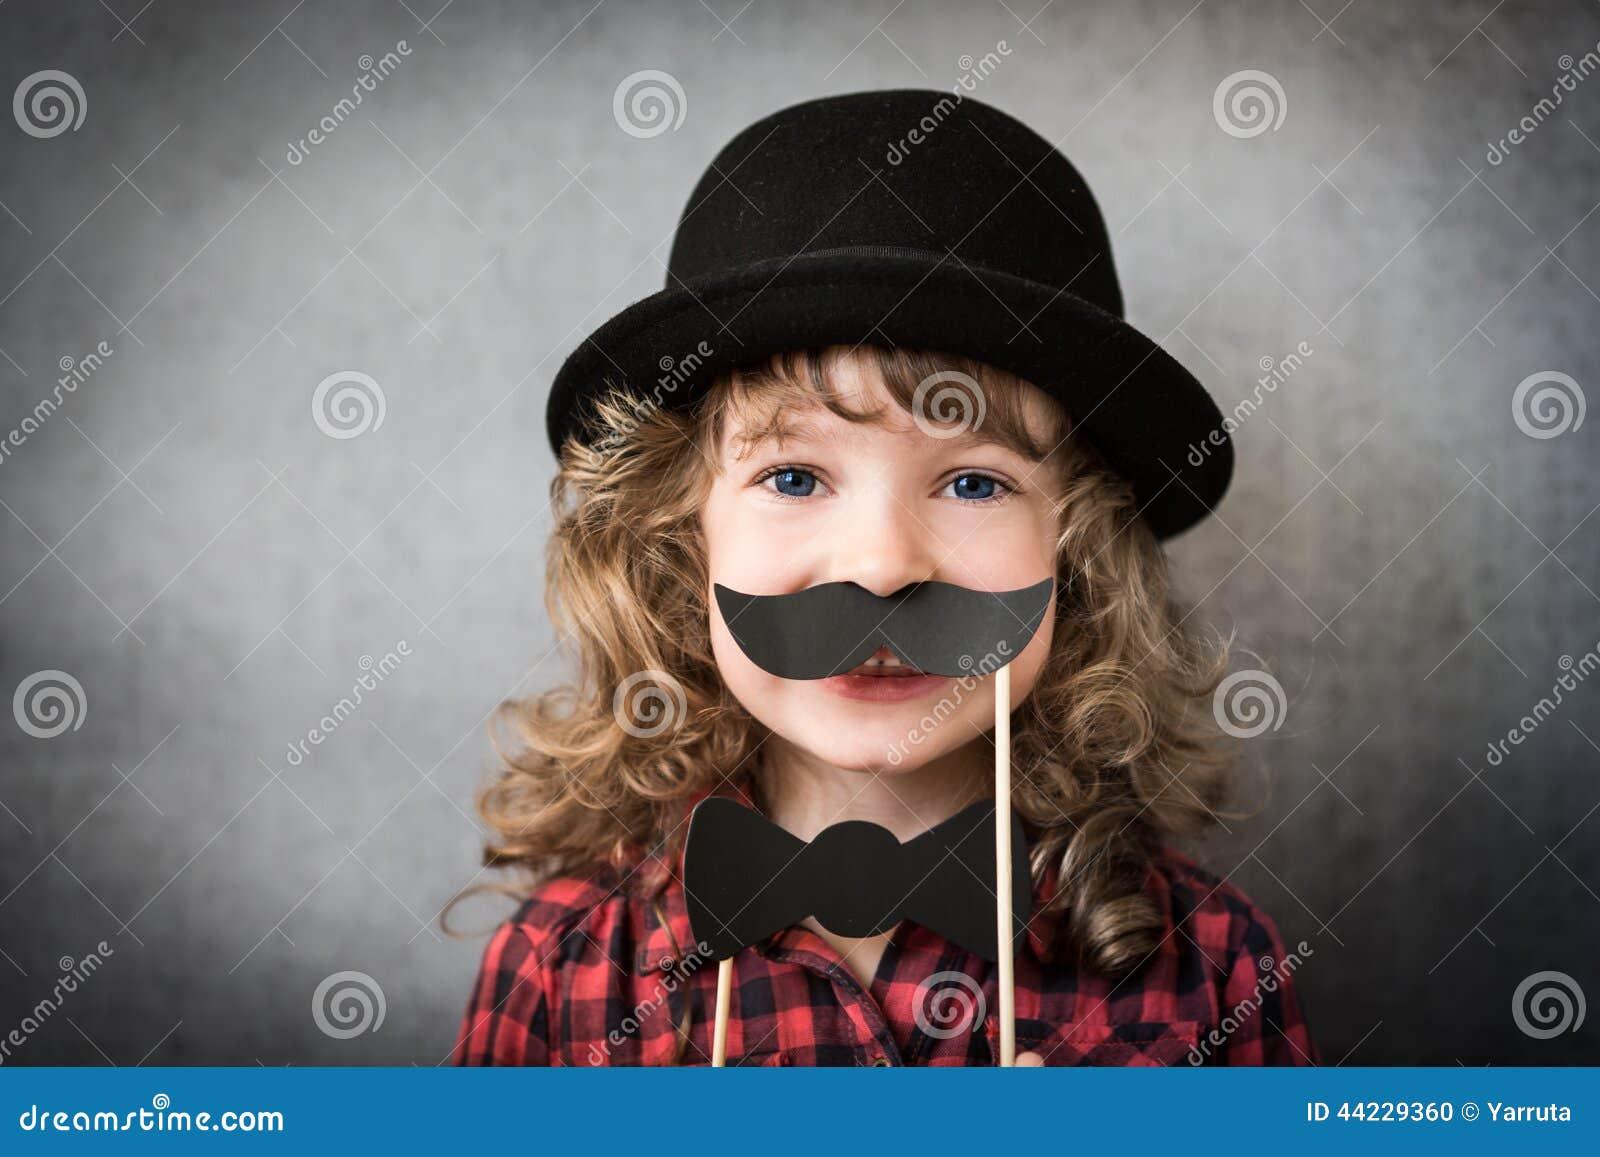 https://thumbs.dreamstime.com/z/funny-hipster-kid-studio-44229360.jpg